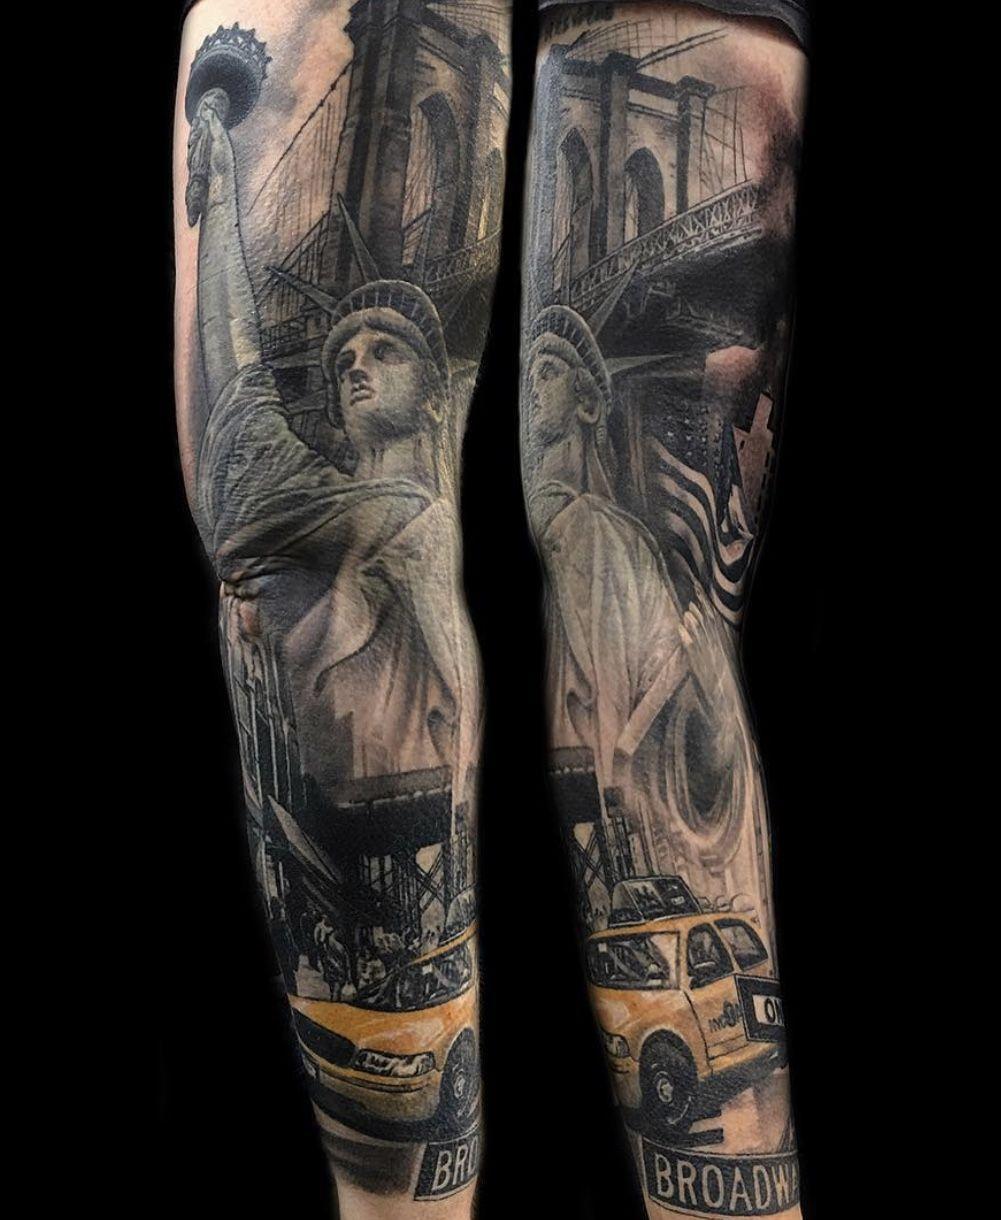 #newyork #newyorktattoo #tattooidea #realistictattoo #realismtattoo #tattooideas #londontattoo #tattoolondon #sixbulletstattoo #londontattoostudio #tattoosleeve #tattoodesign #newyorkcity #architecture #londontattooartist #londontattoos #realisticink blackandgreyartist #blackandgreytattoo #blackandgreylondon